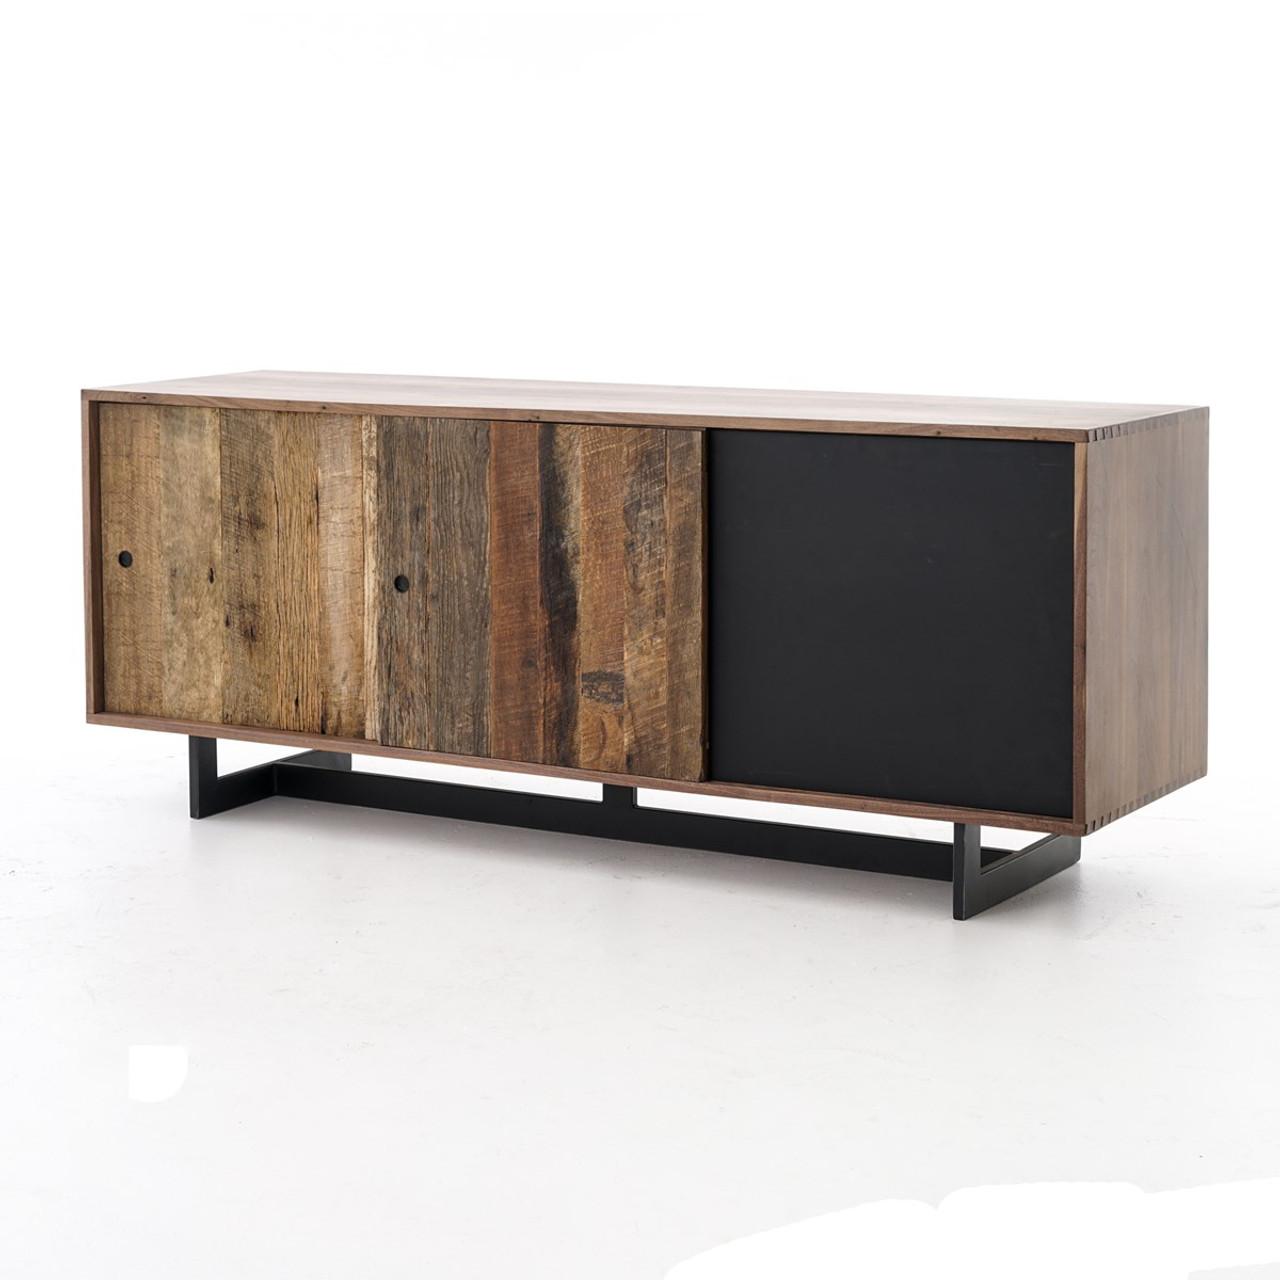 industrial media furniture. Anderson Industrial Rustic Oak Wood And Metal Media Console Furniture A